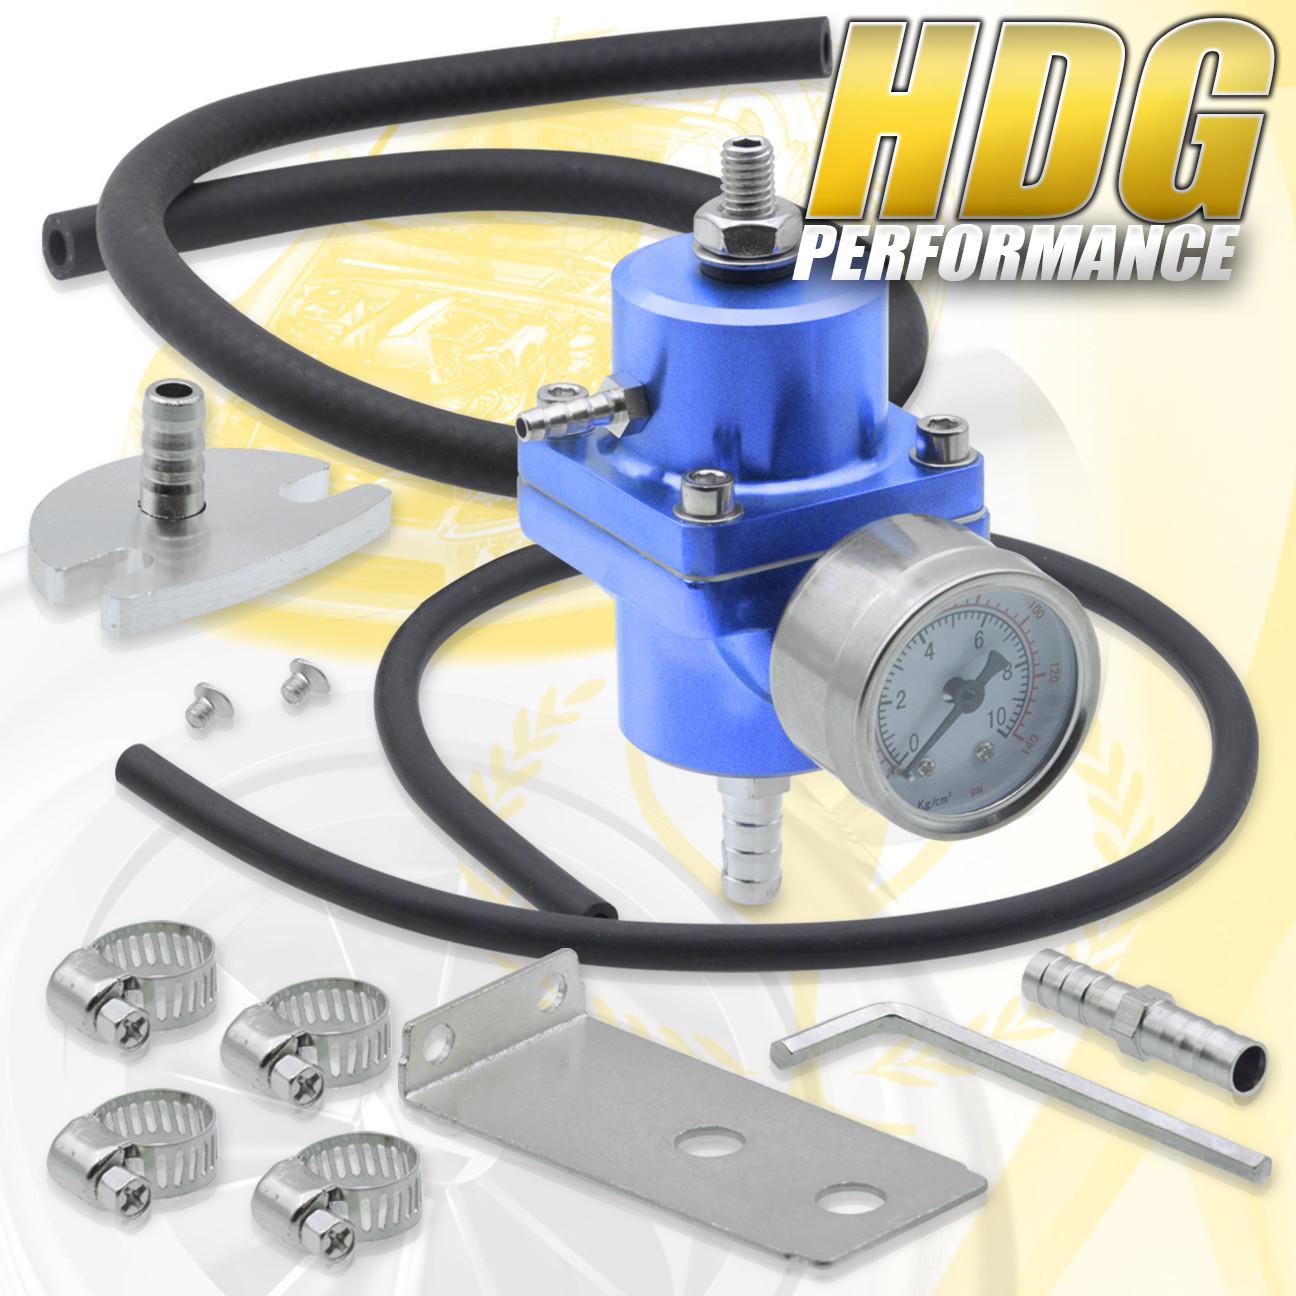 140 Psi Oil Gauge Black Jdm Kit Adjustable Aluminum Fuel Pressure Regulator